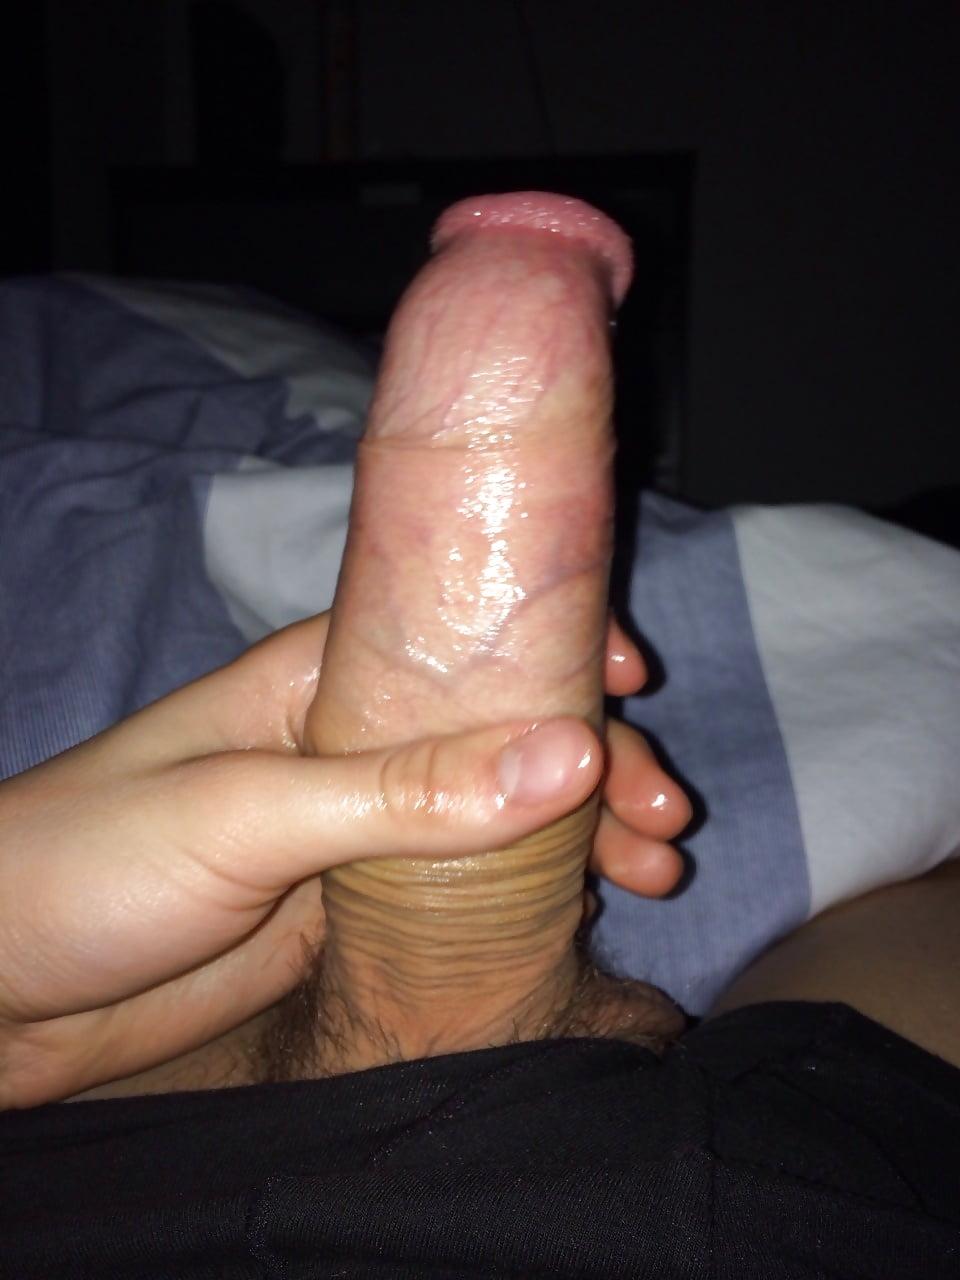 chat Webcam gay